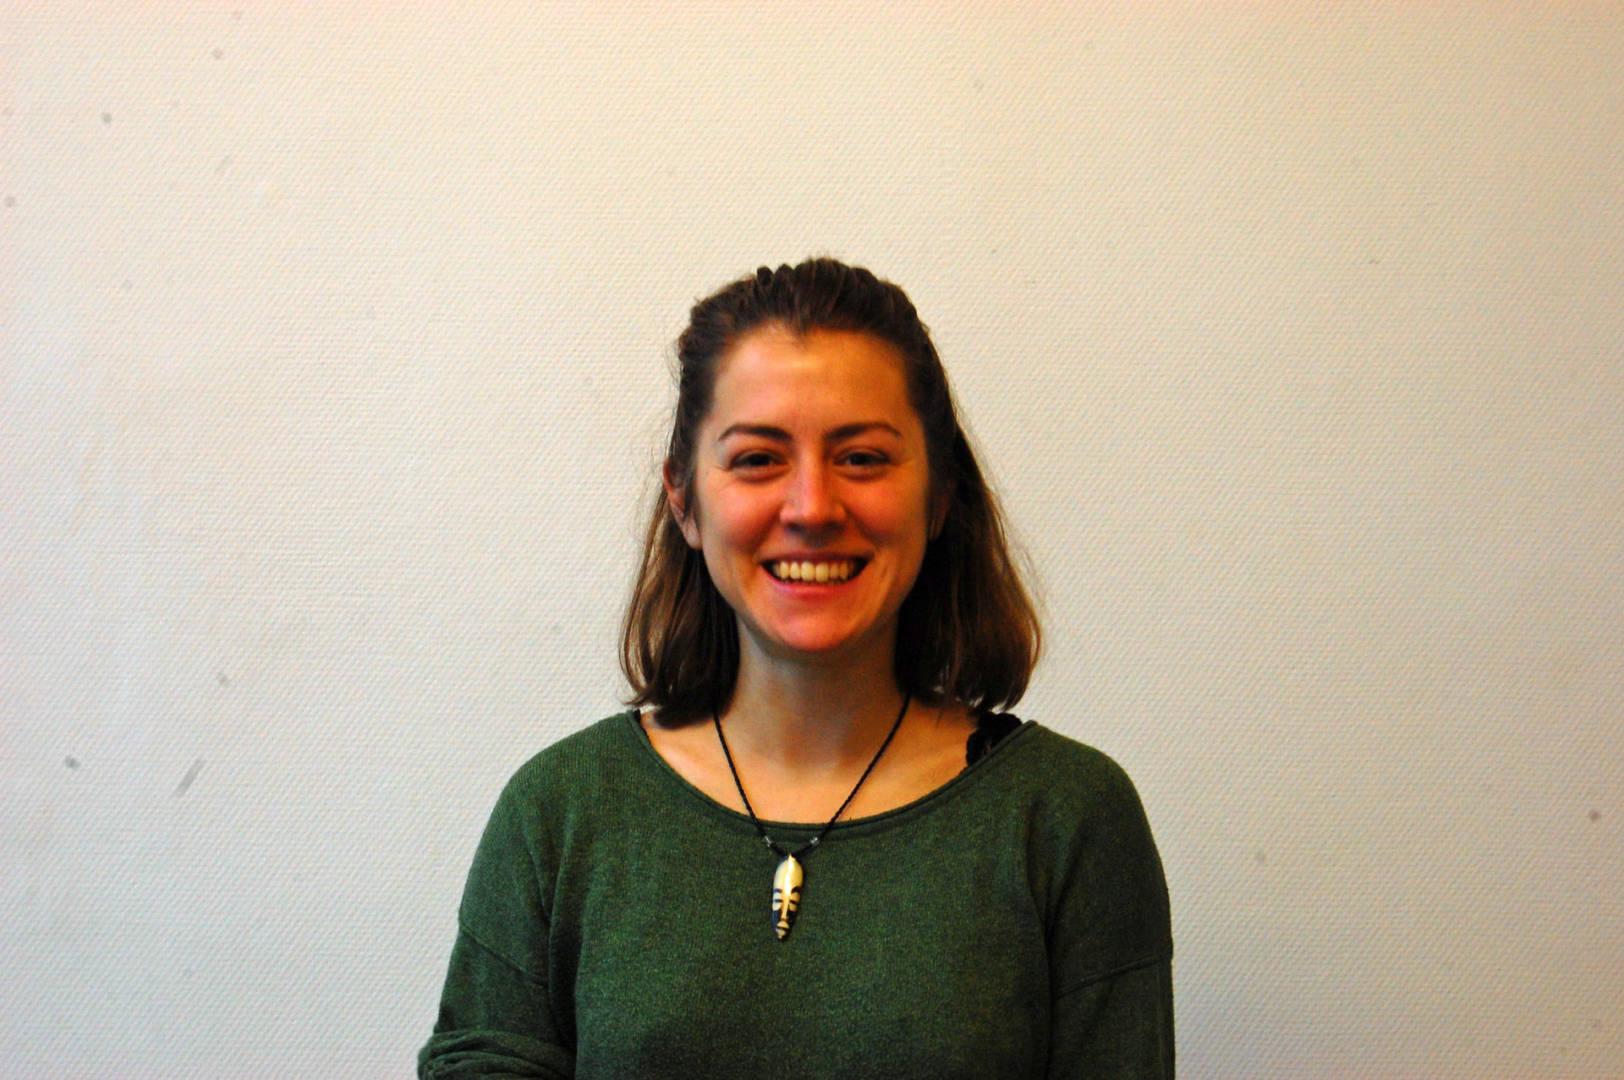 Thessa Gebhardt